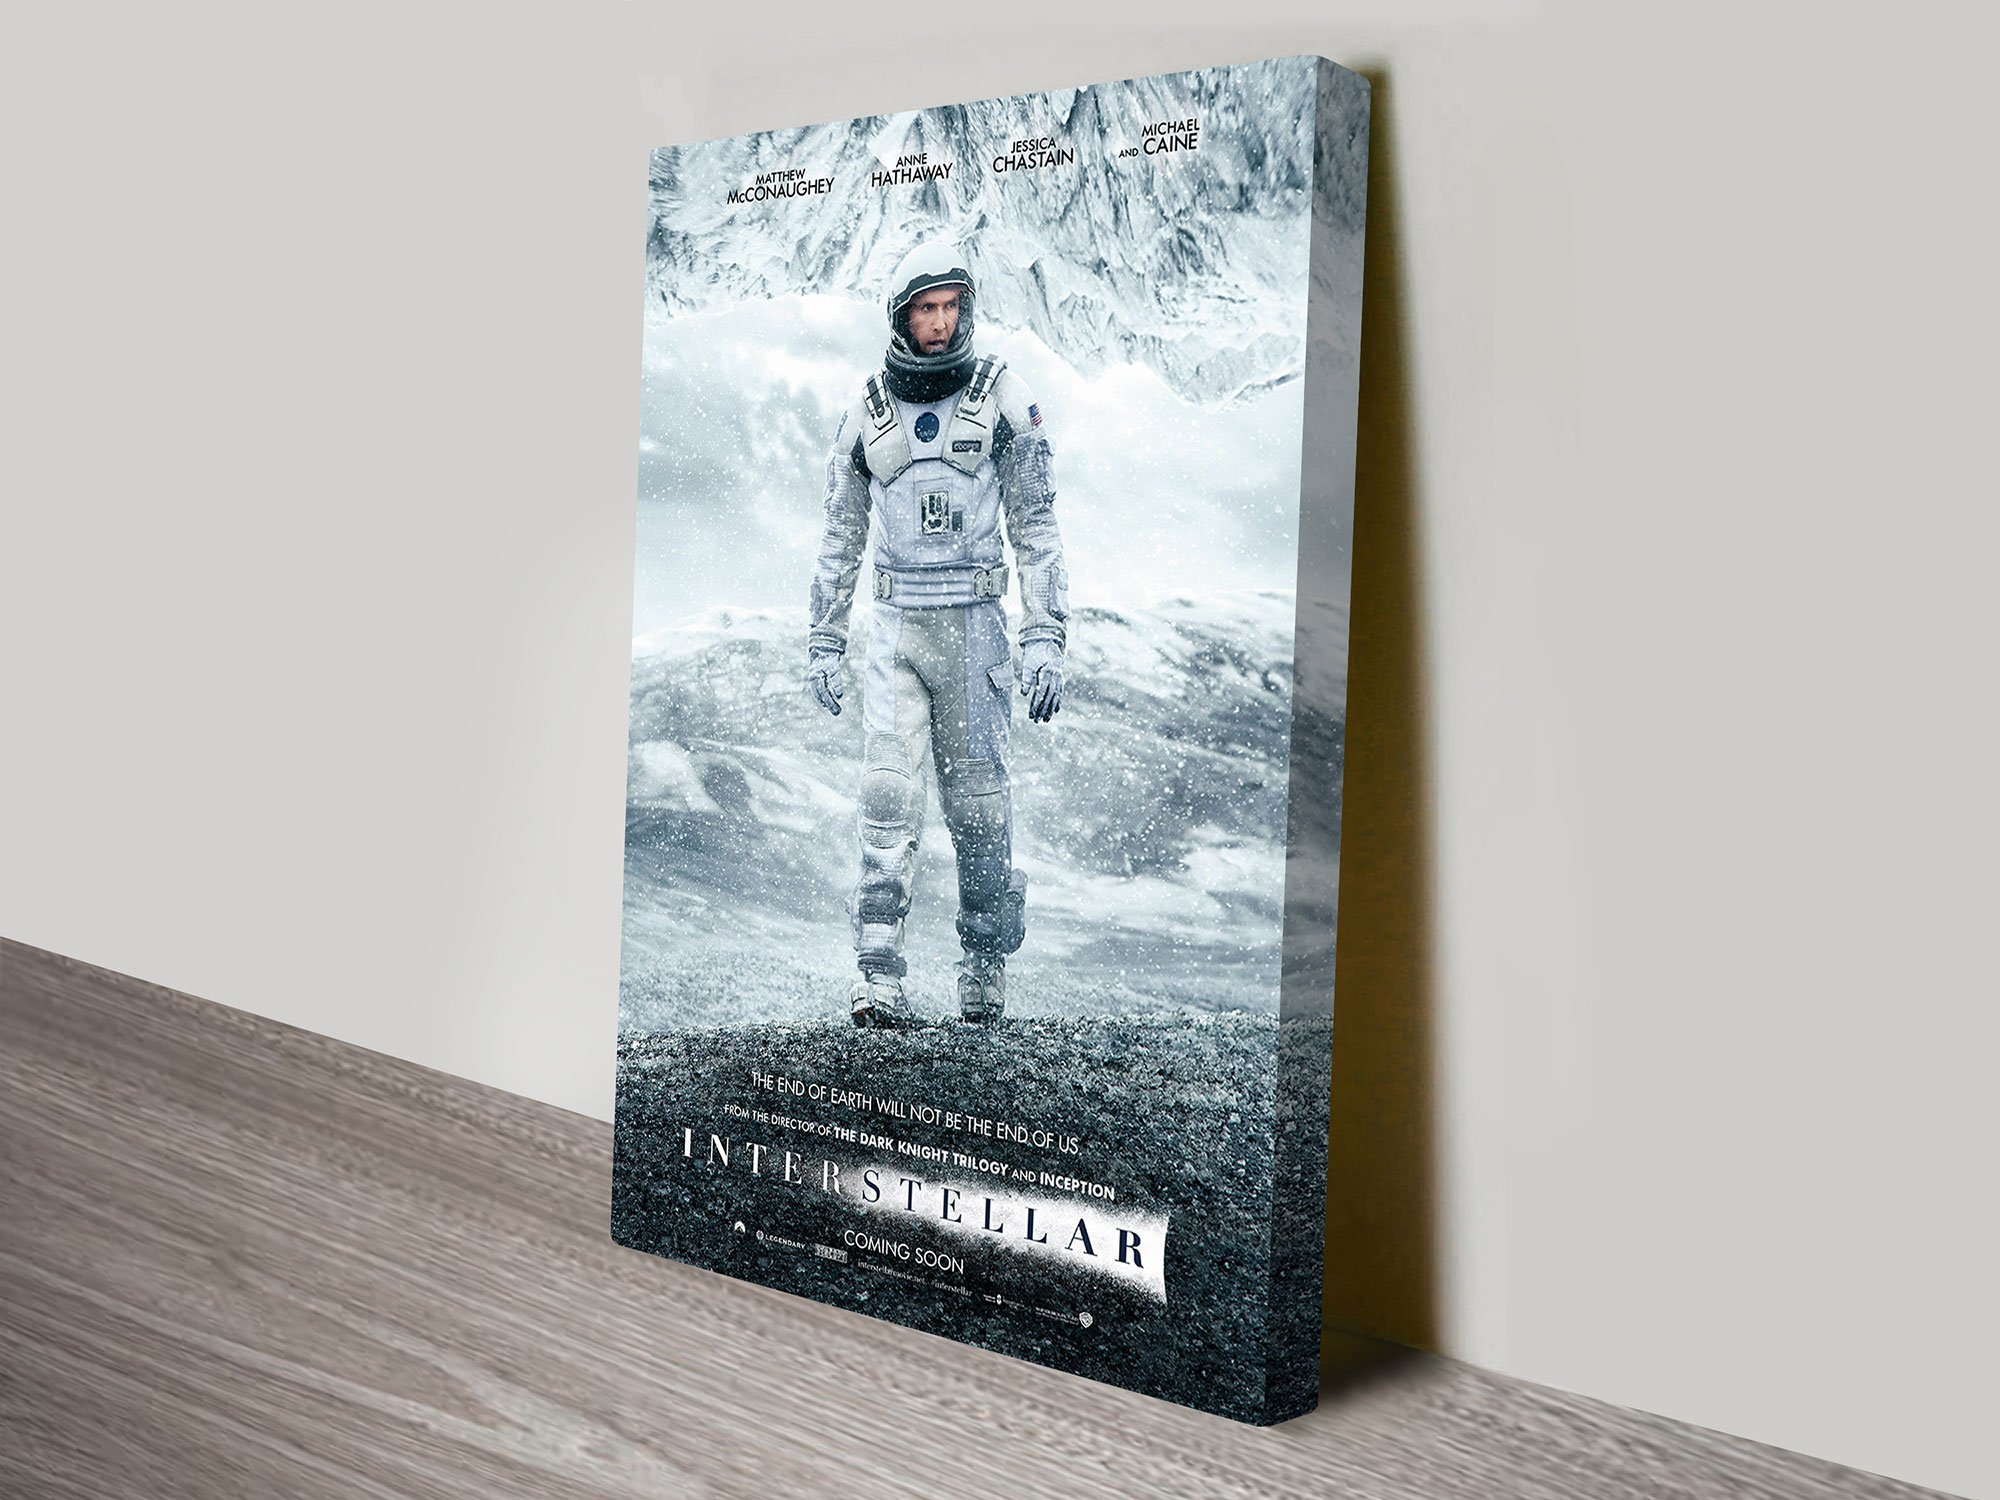 Interstellar Sci-Fi Movie Posters Print